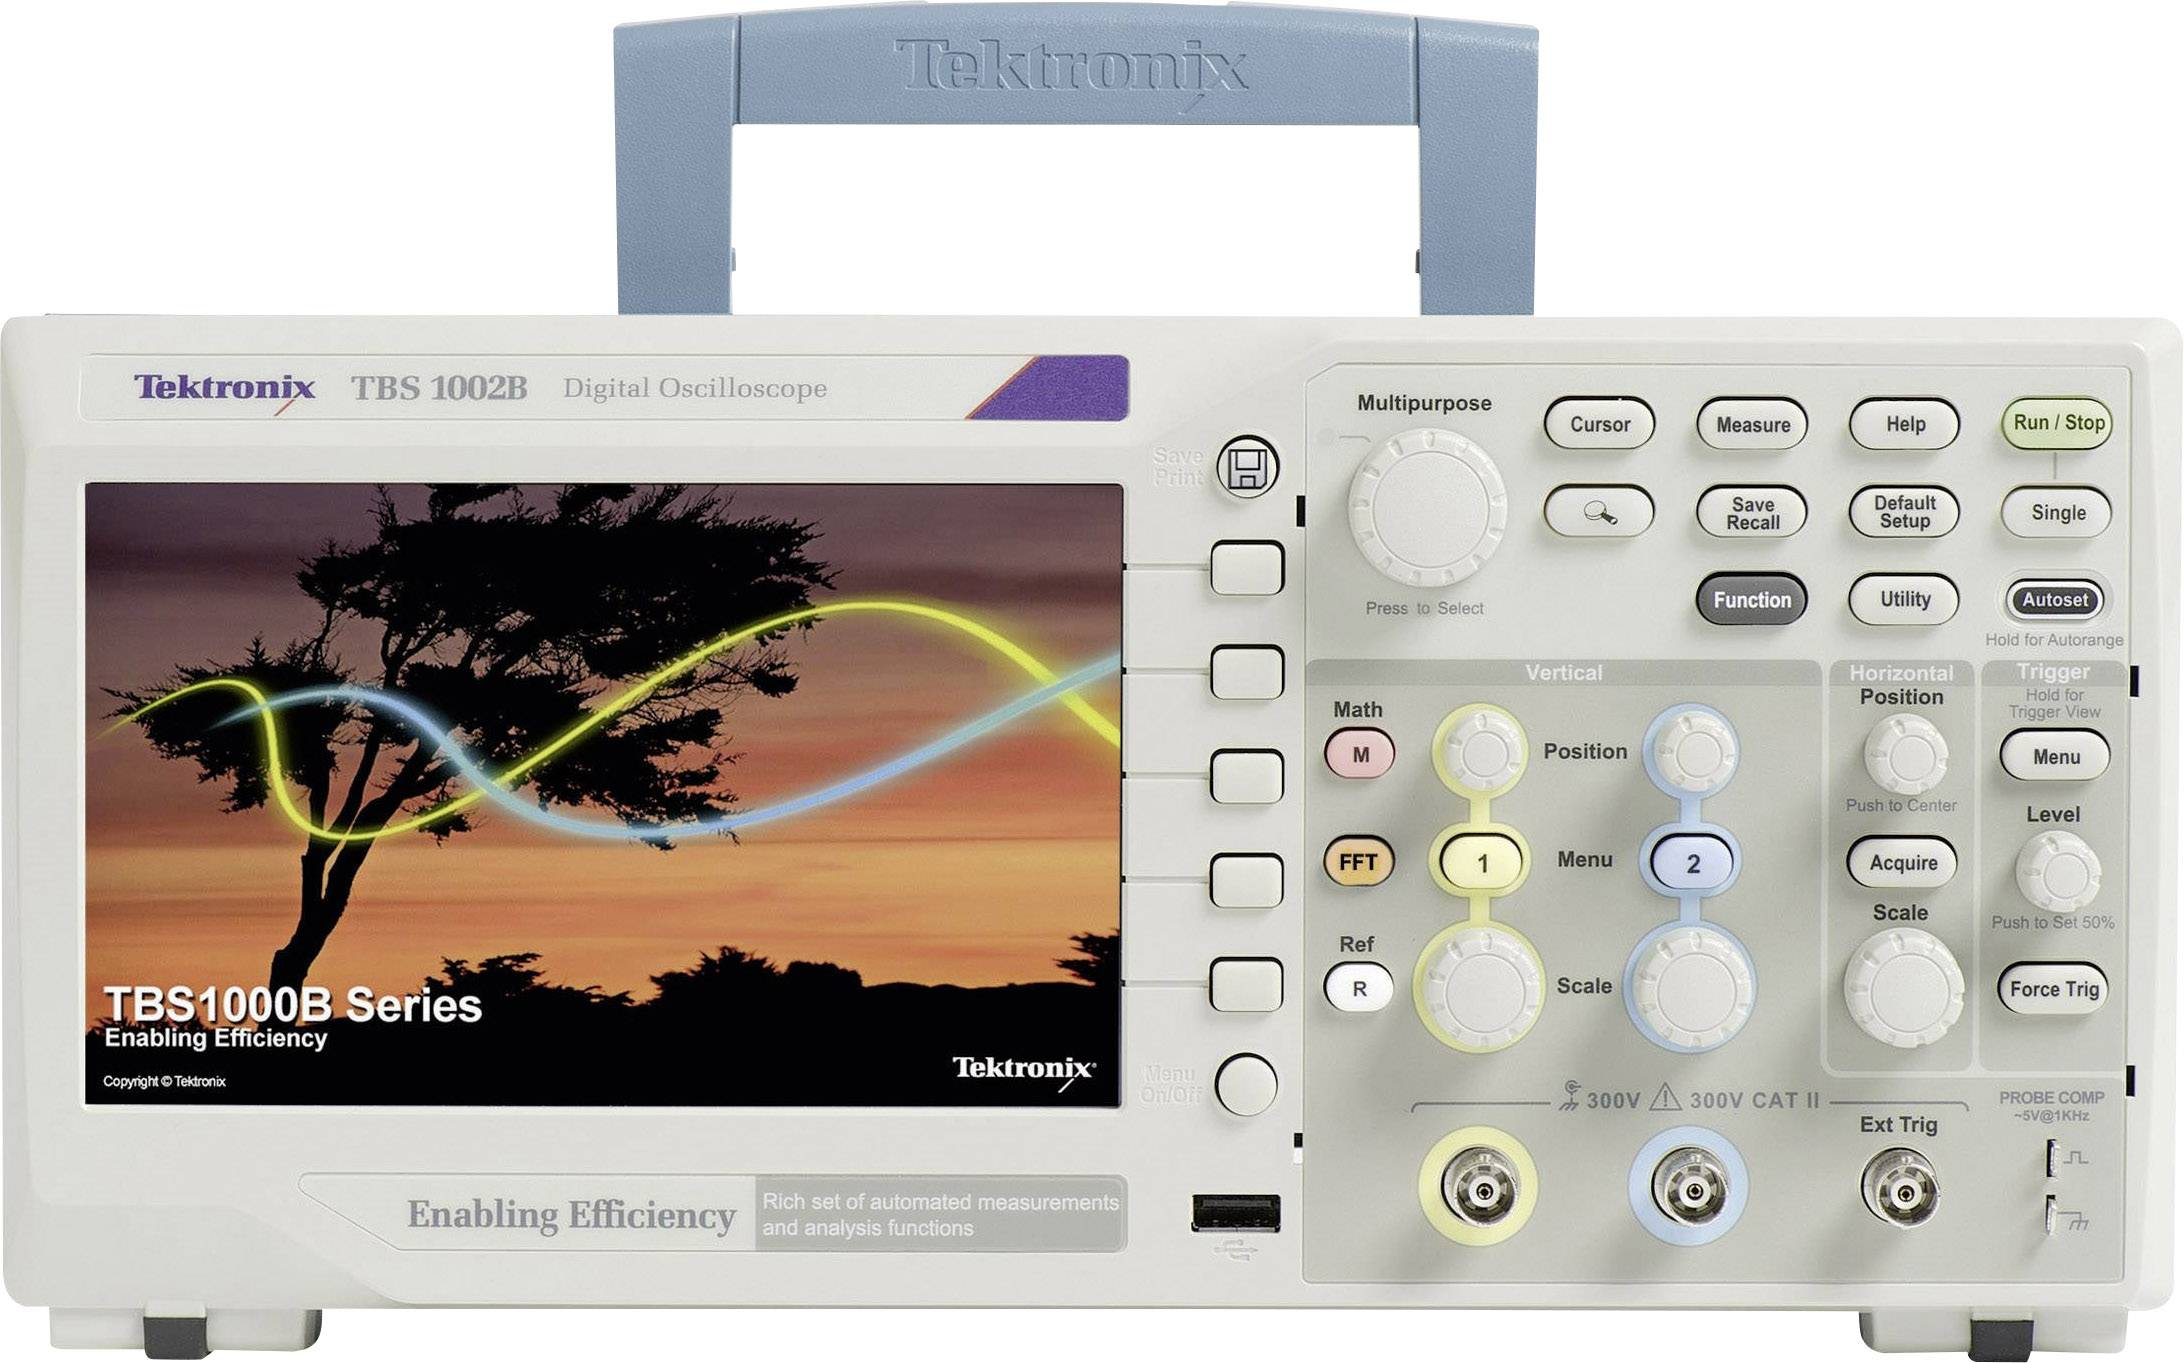 Digitálny osciloskop Tektronix TBS1152B, 150 MHz, 2-kanálový, kalibrácia podľa ISO